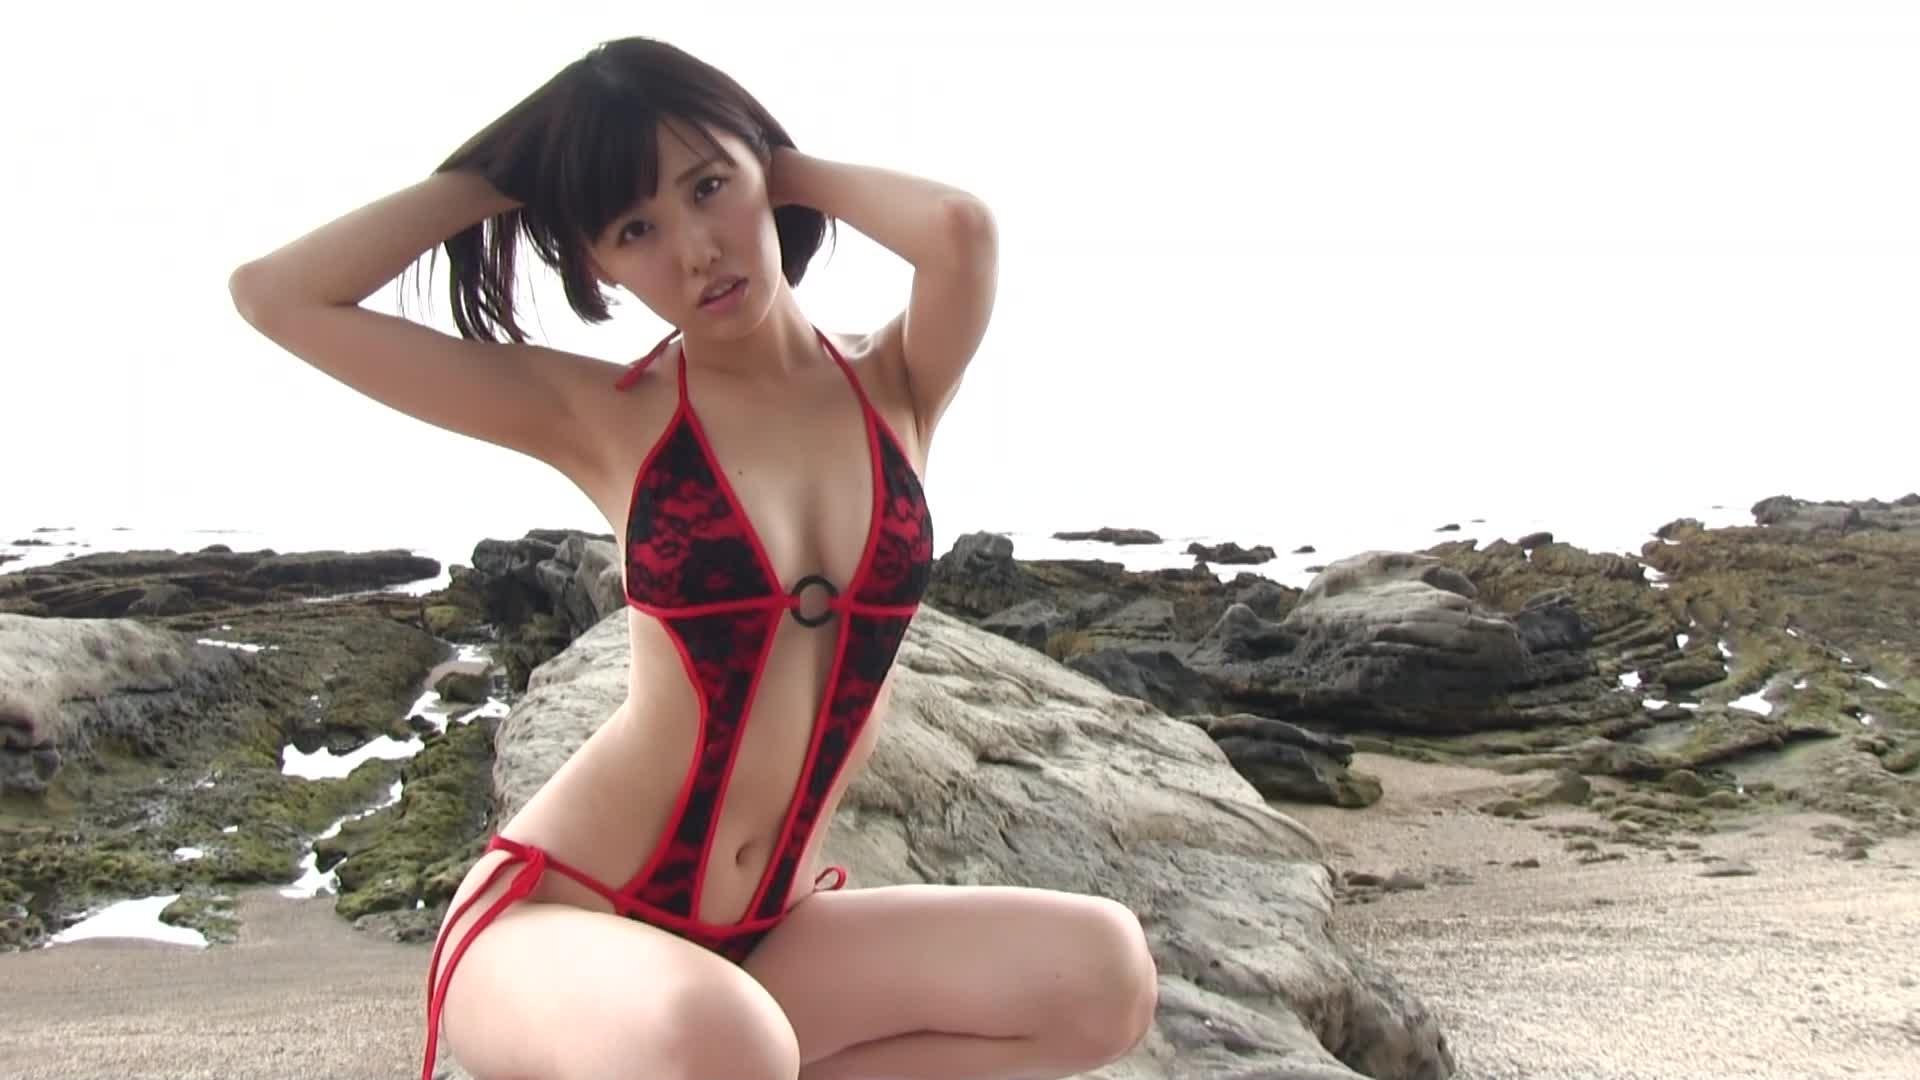 c8 - ひとりバカンス/稲森美優